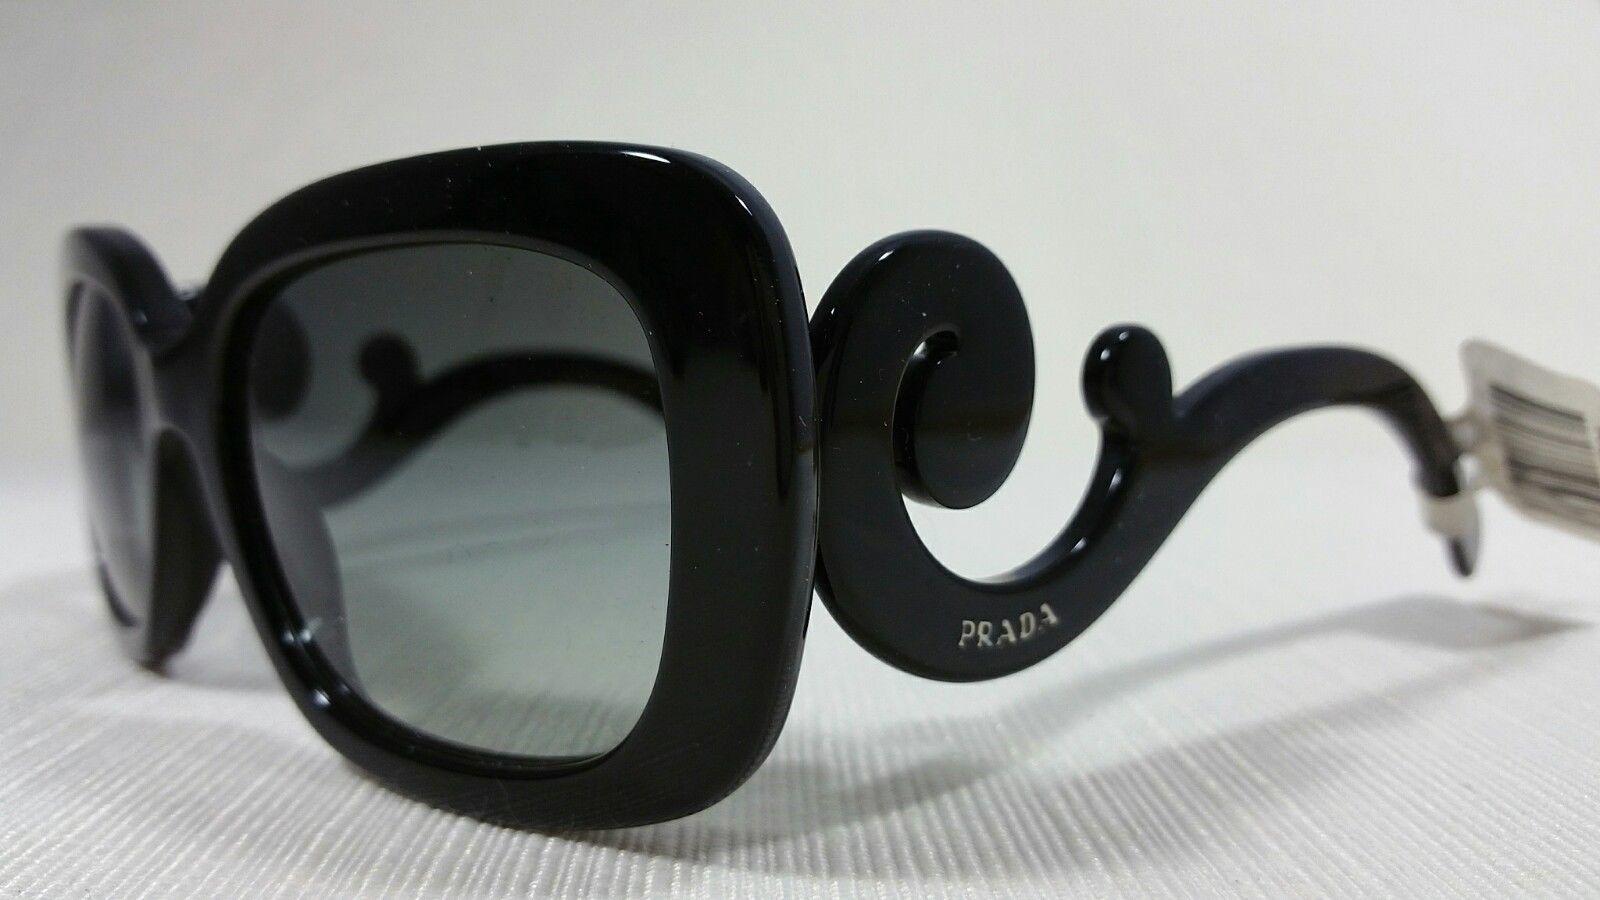 5a9f9ad52 57. 57. Prada SPR270 Black Square Frame Women's Sunglasses Gray Gradient  Lenses NWT